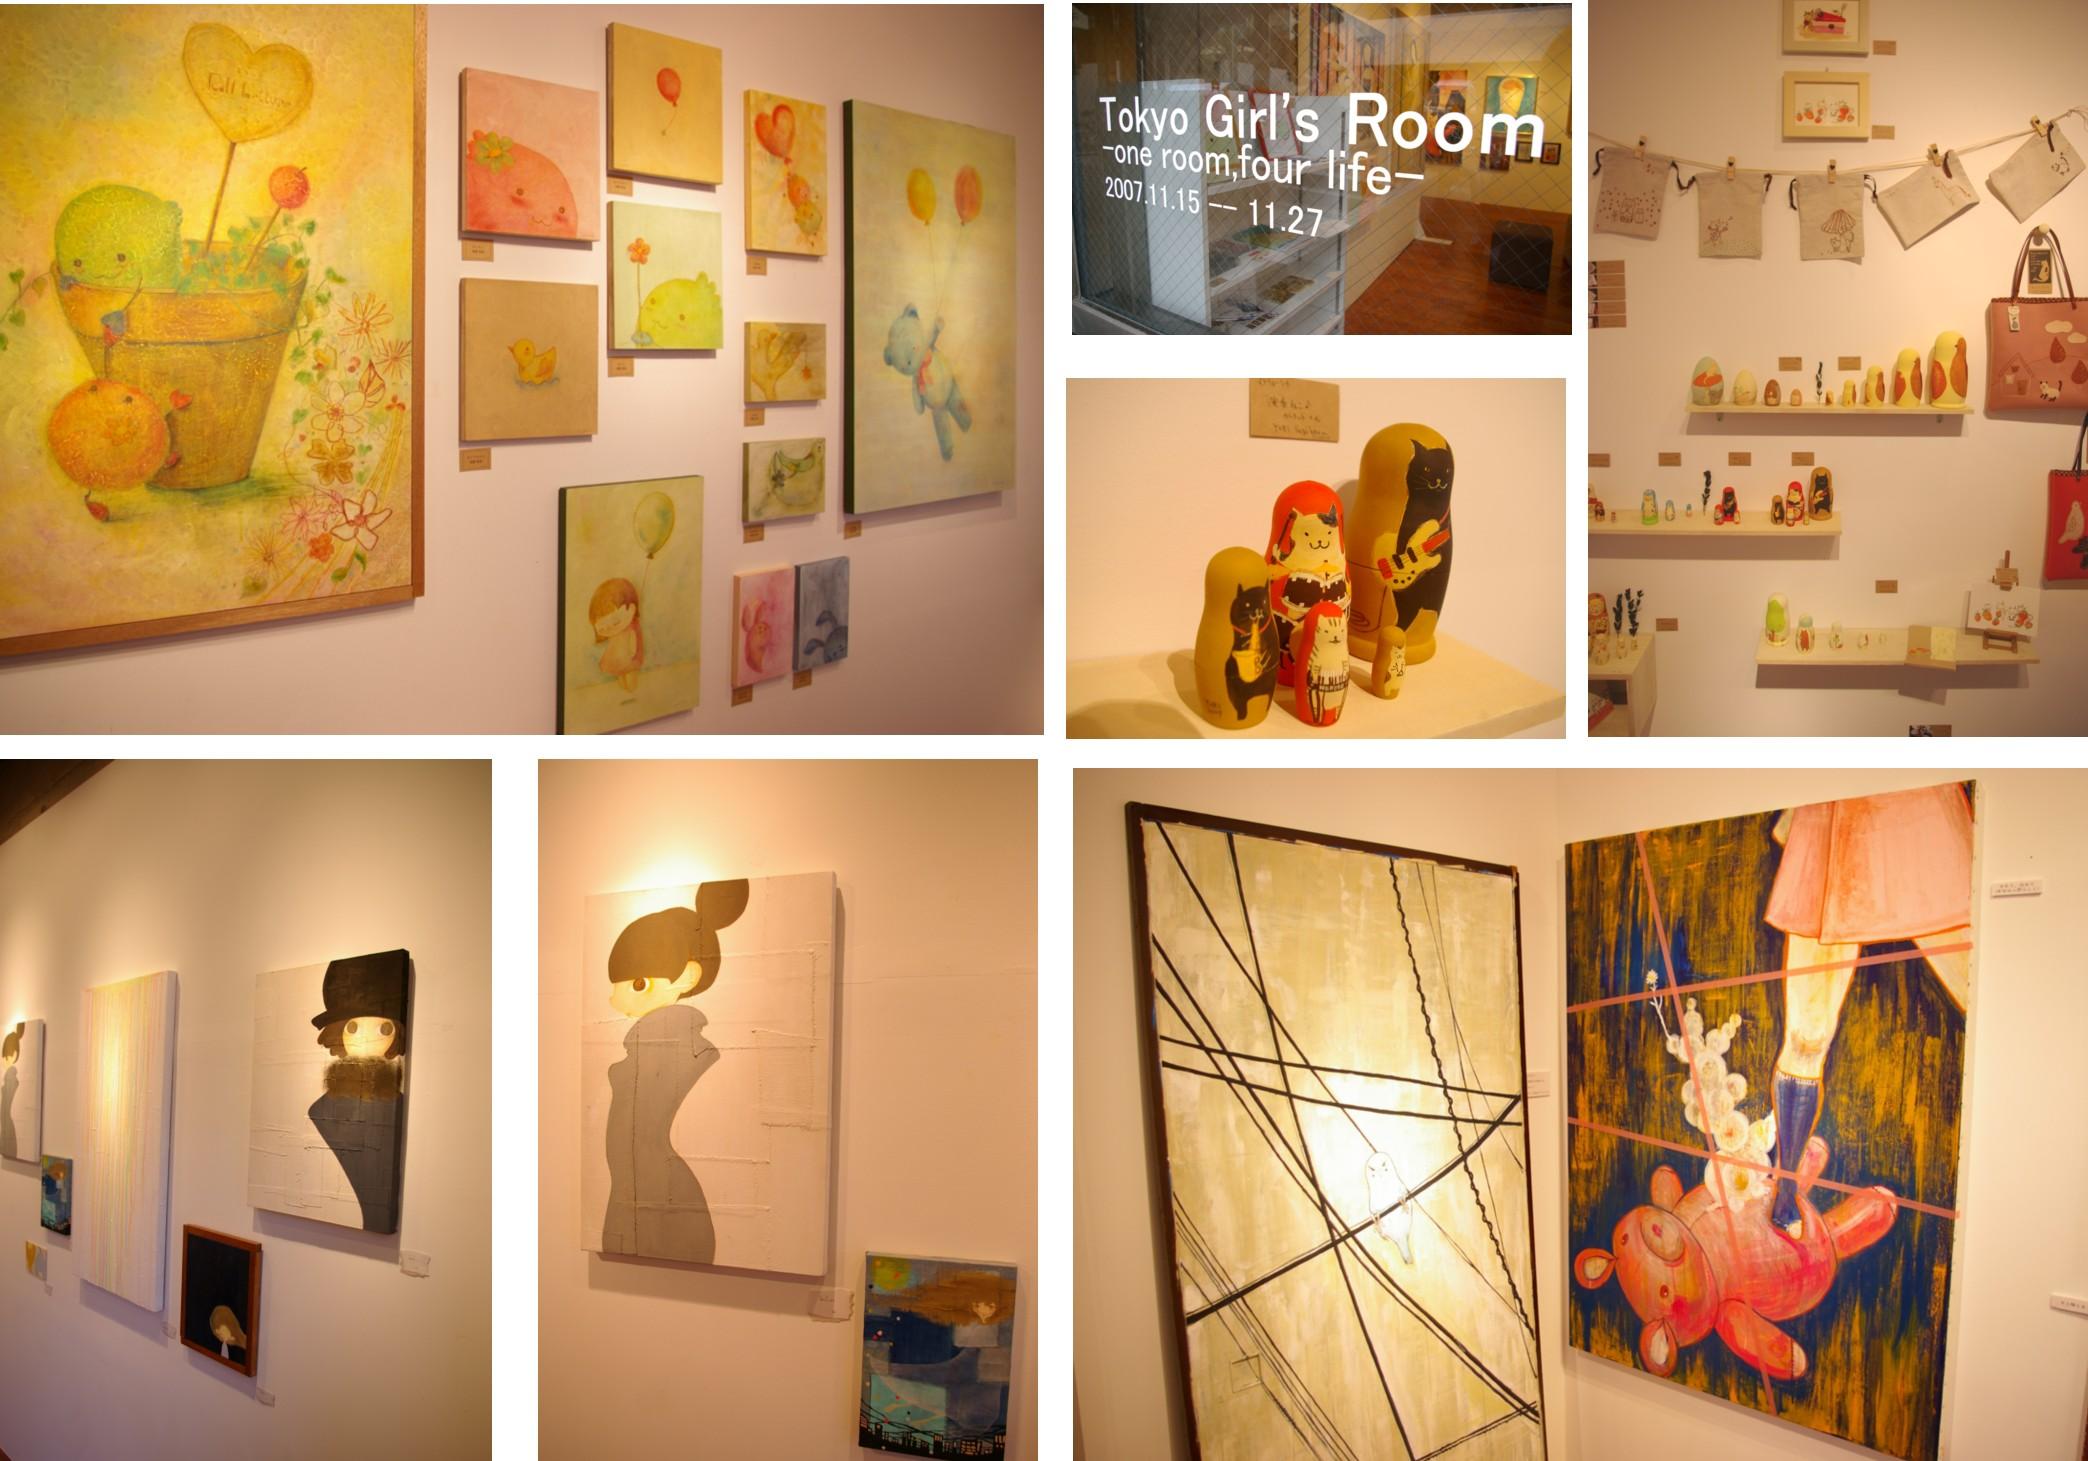 「Tokyo Girl\'s Room -one room,four life-」_a0104621_187934.jpg